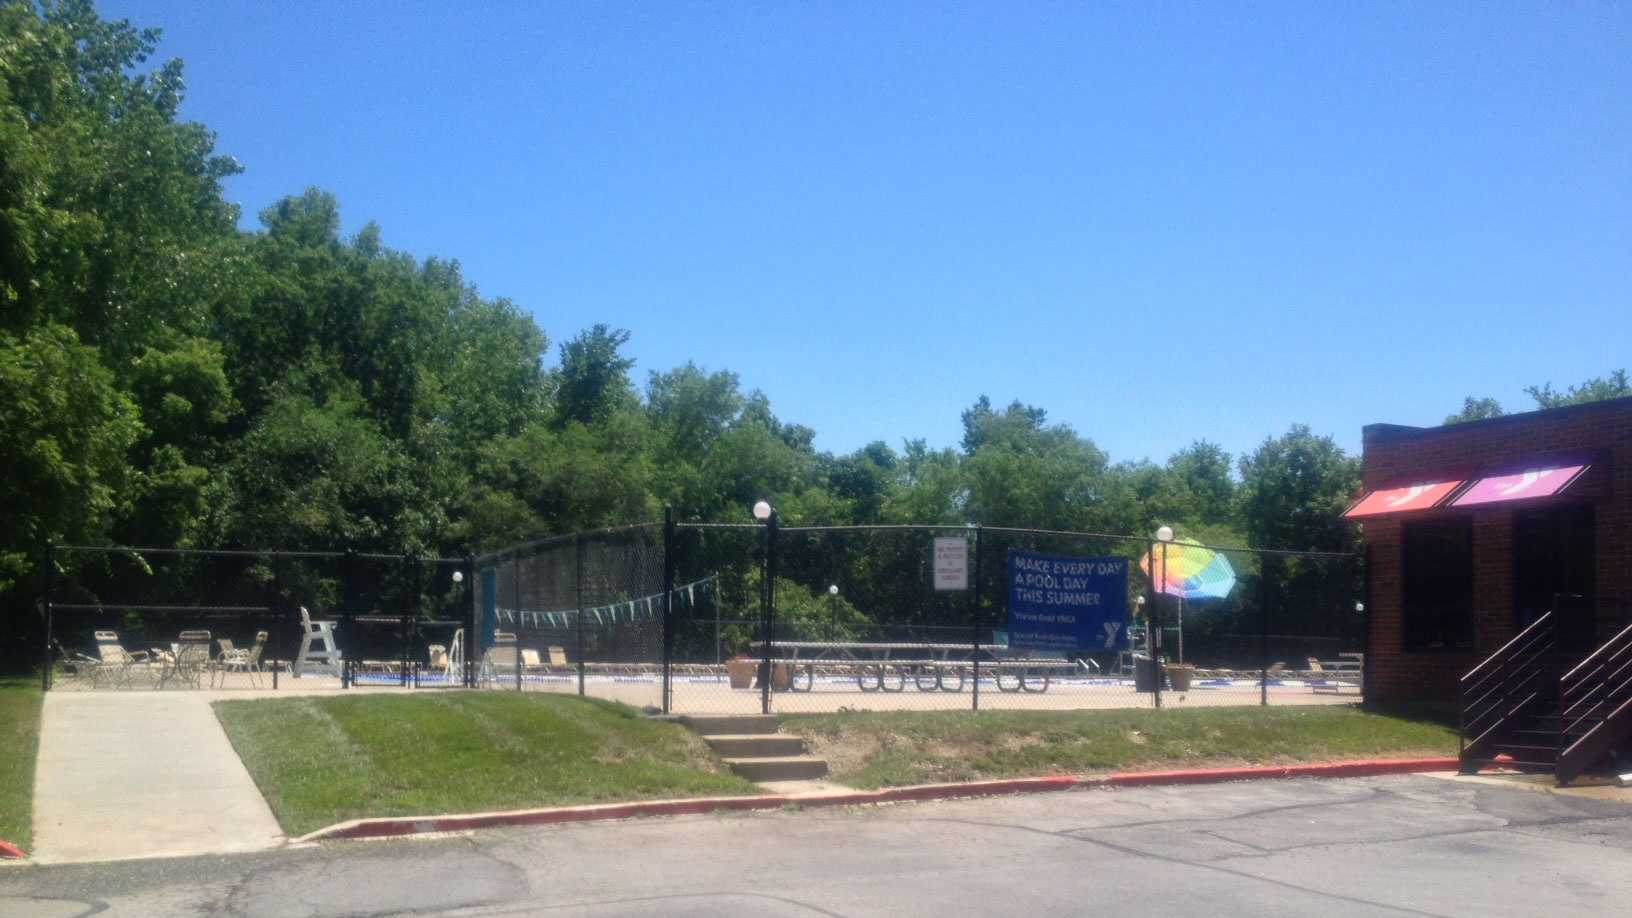 YMCA Vivion pool